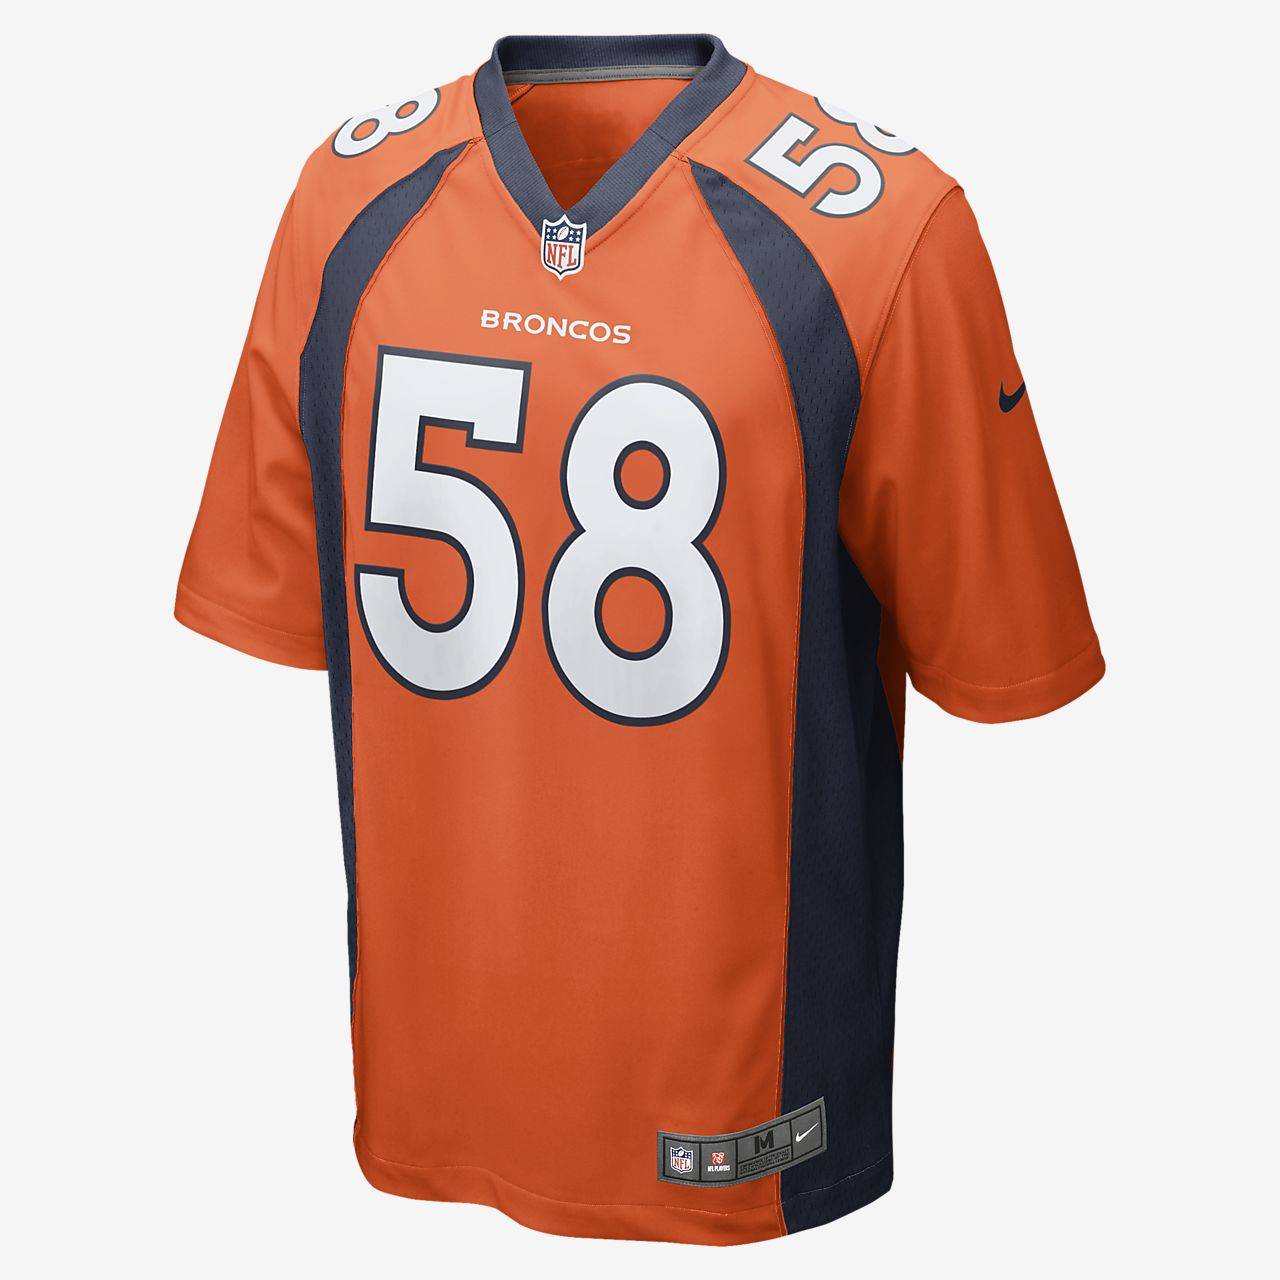 Camiseta de fútbol americano para hombre NFL Denver Broncos (Von Miller)